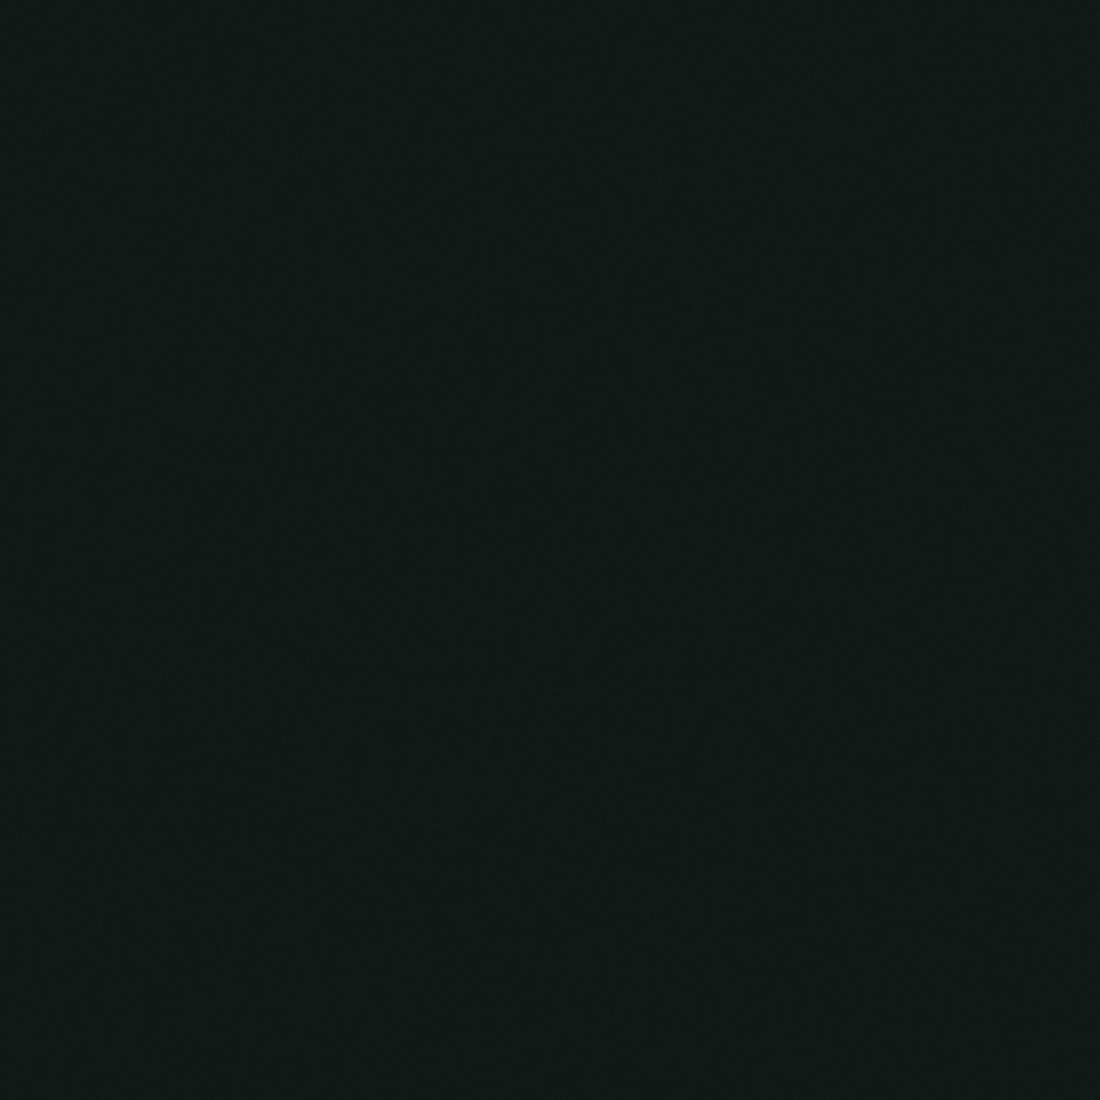 0190PE - Negro